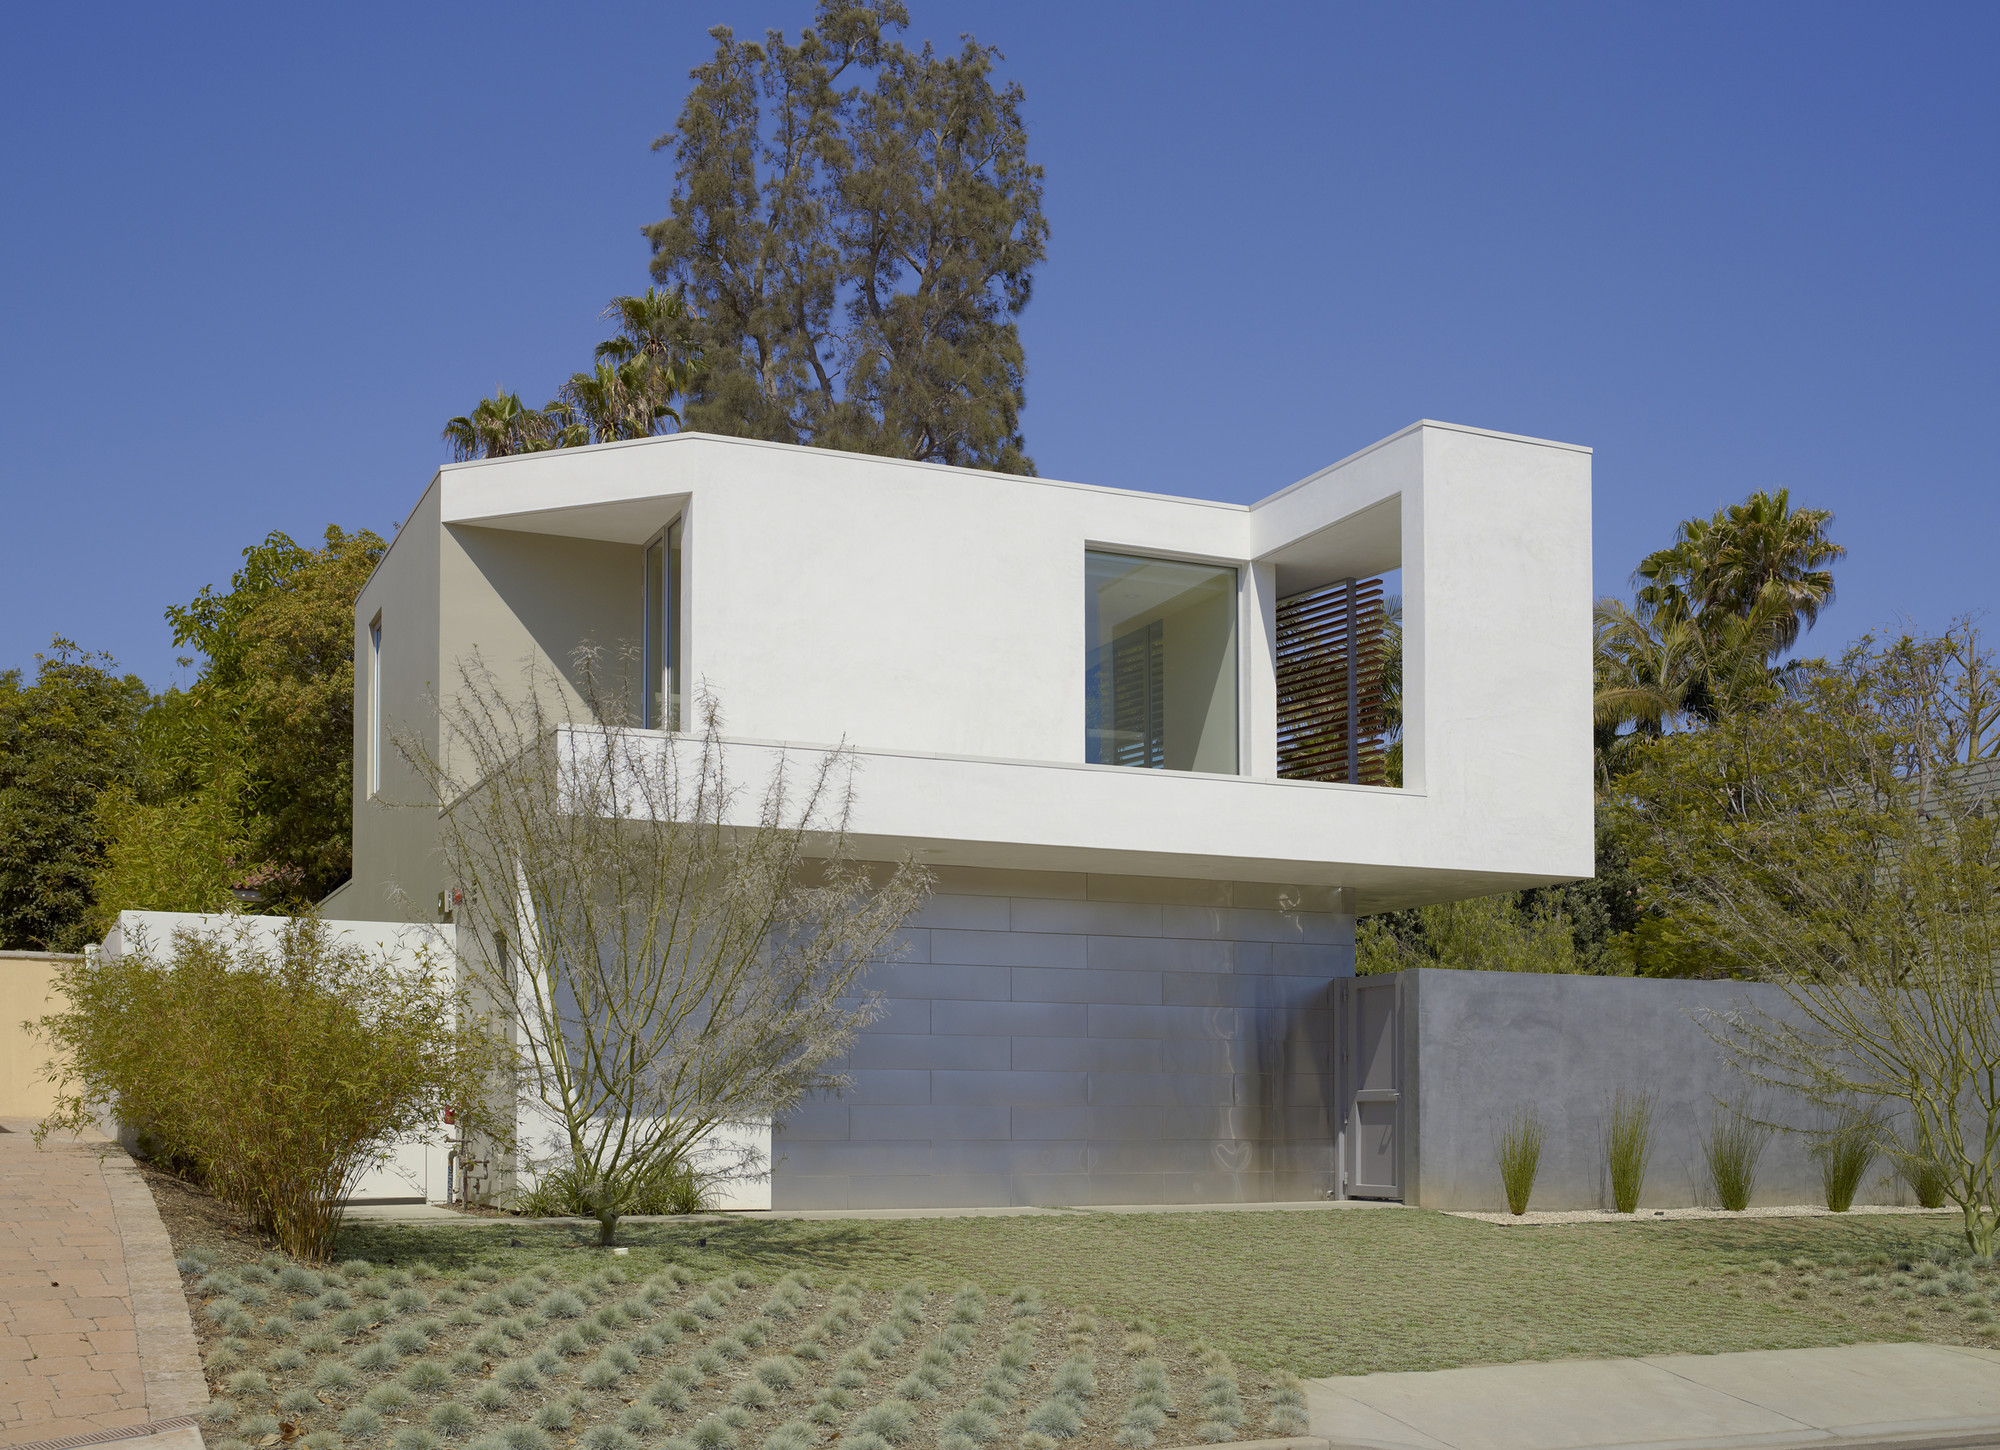 Gallery of ehrlich retreat john friedman alice kimm - Limposante residence contemporaine de ehrlich architects ...